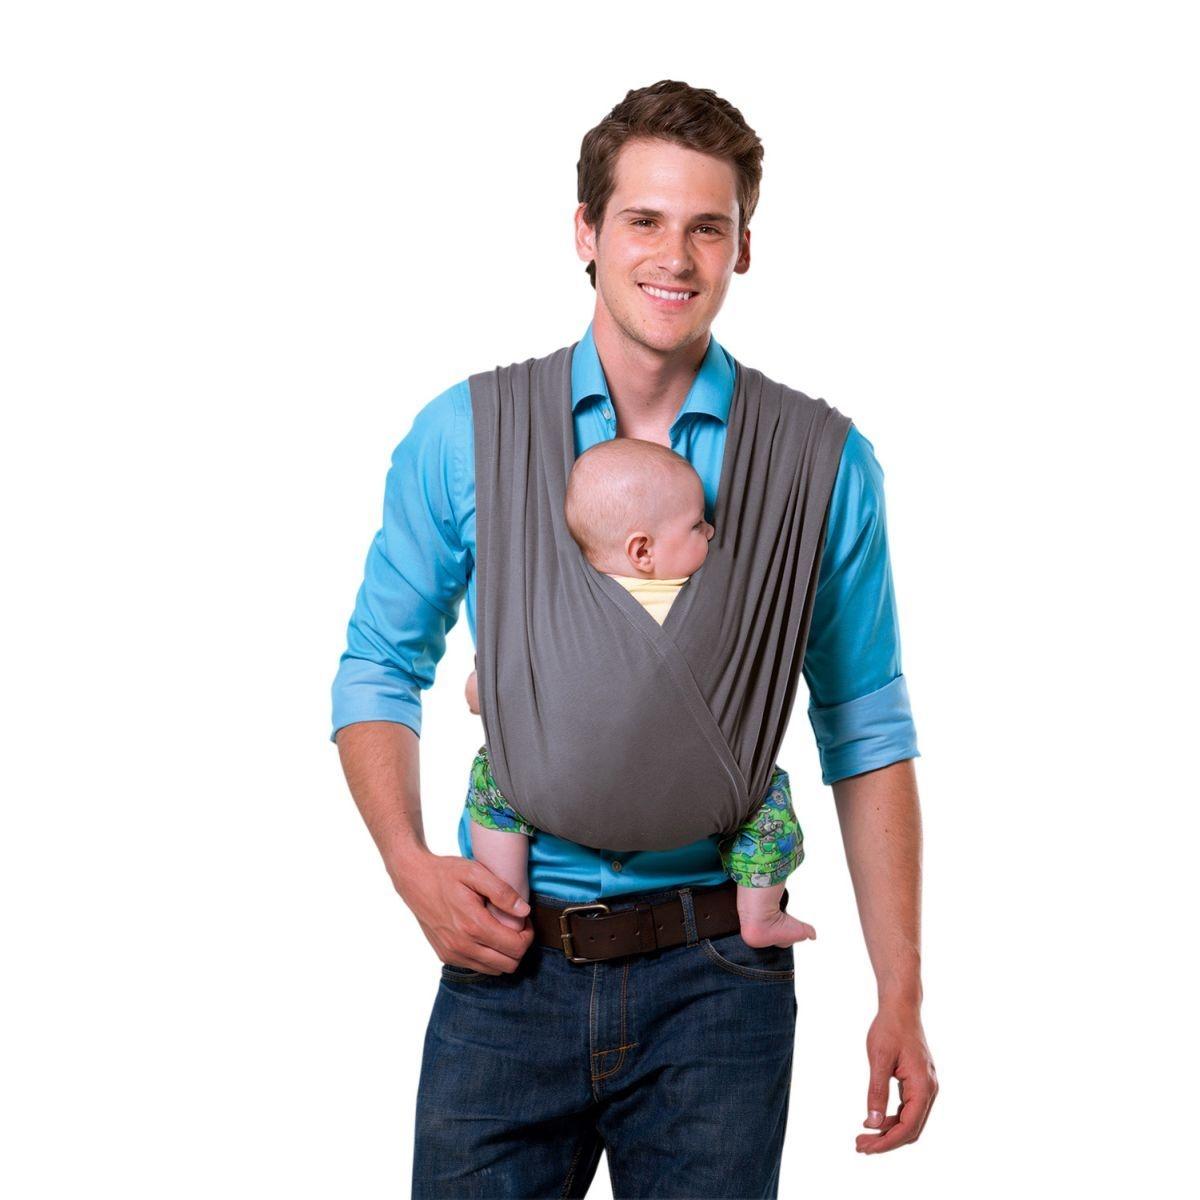 Echarpe de portage sans noeud Carry Baby Stone